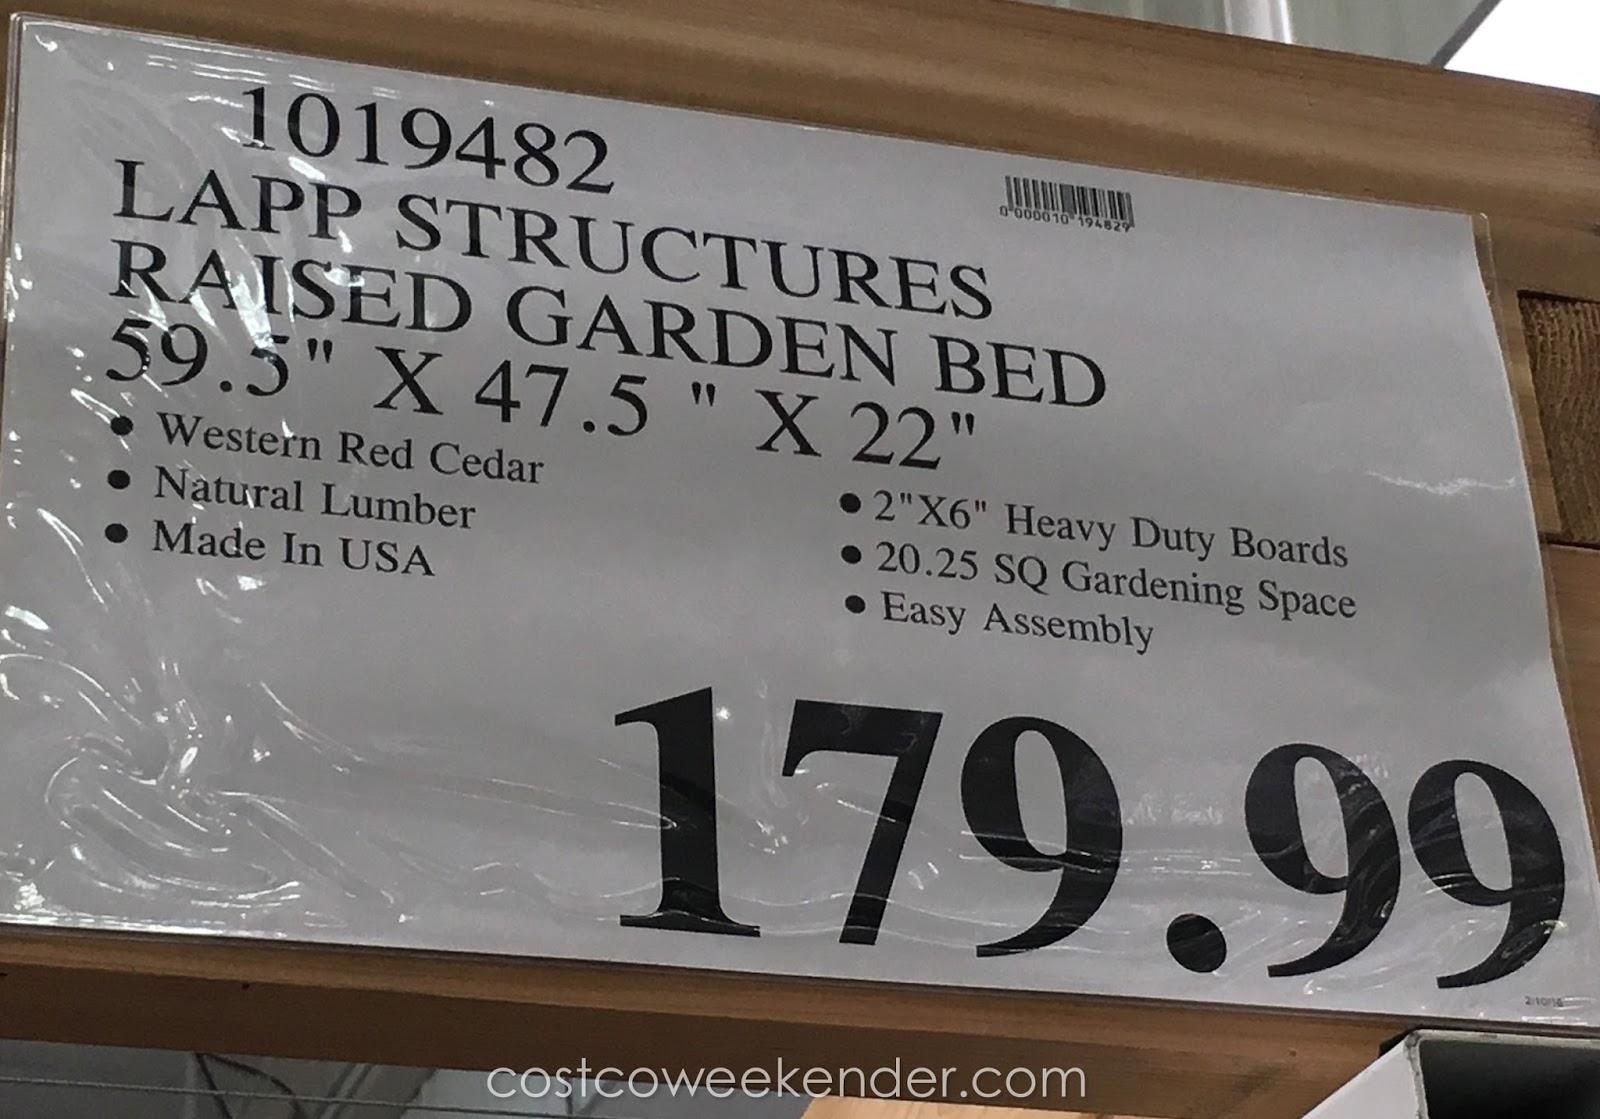 Lapp Structures Yardcraft Western Red Cedar Raised Garden Bed Costco Weekender